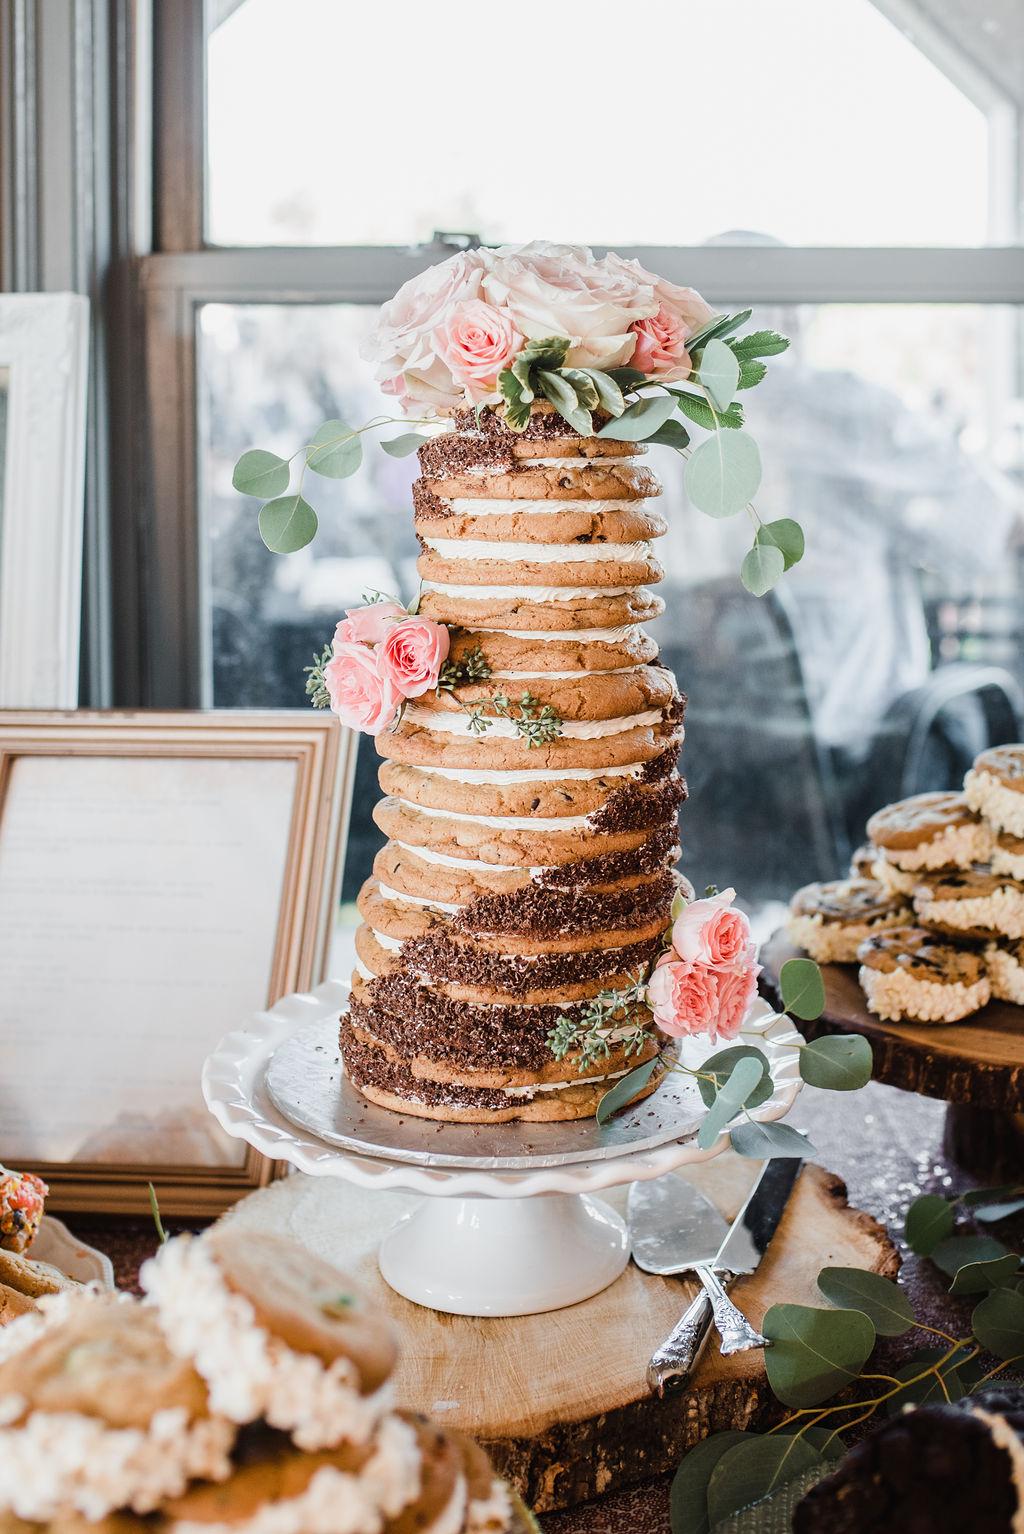 White ruffled edge cake stand  Cake cutting set  Photo by  Rachel Peters